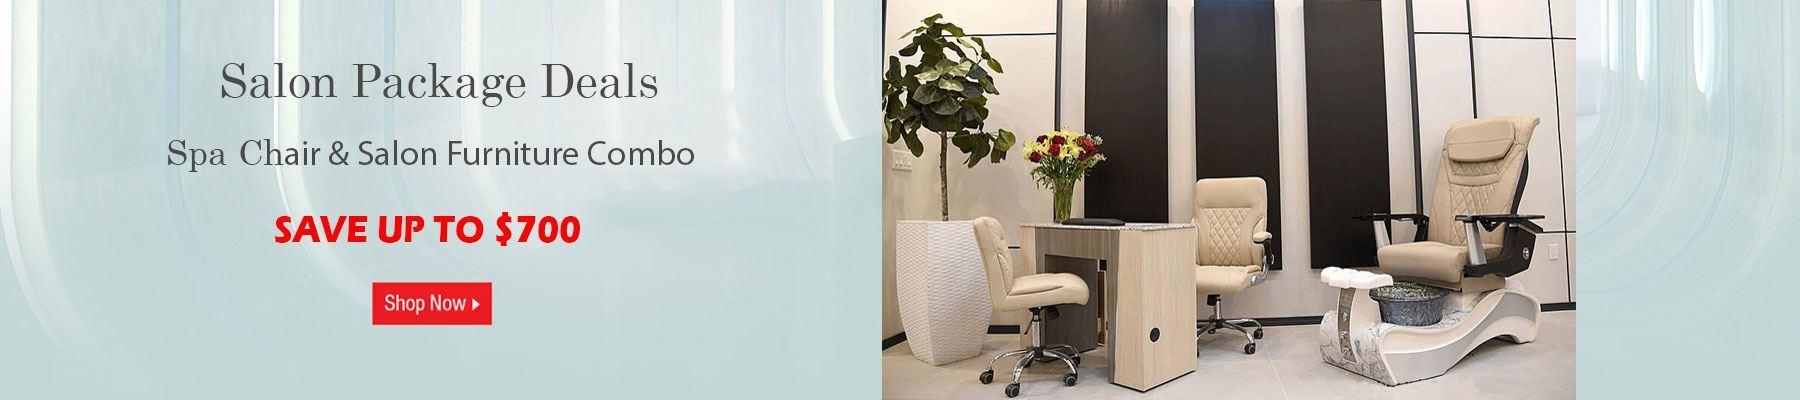 Pedicure Chairs & Salon Furniture Package Deals